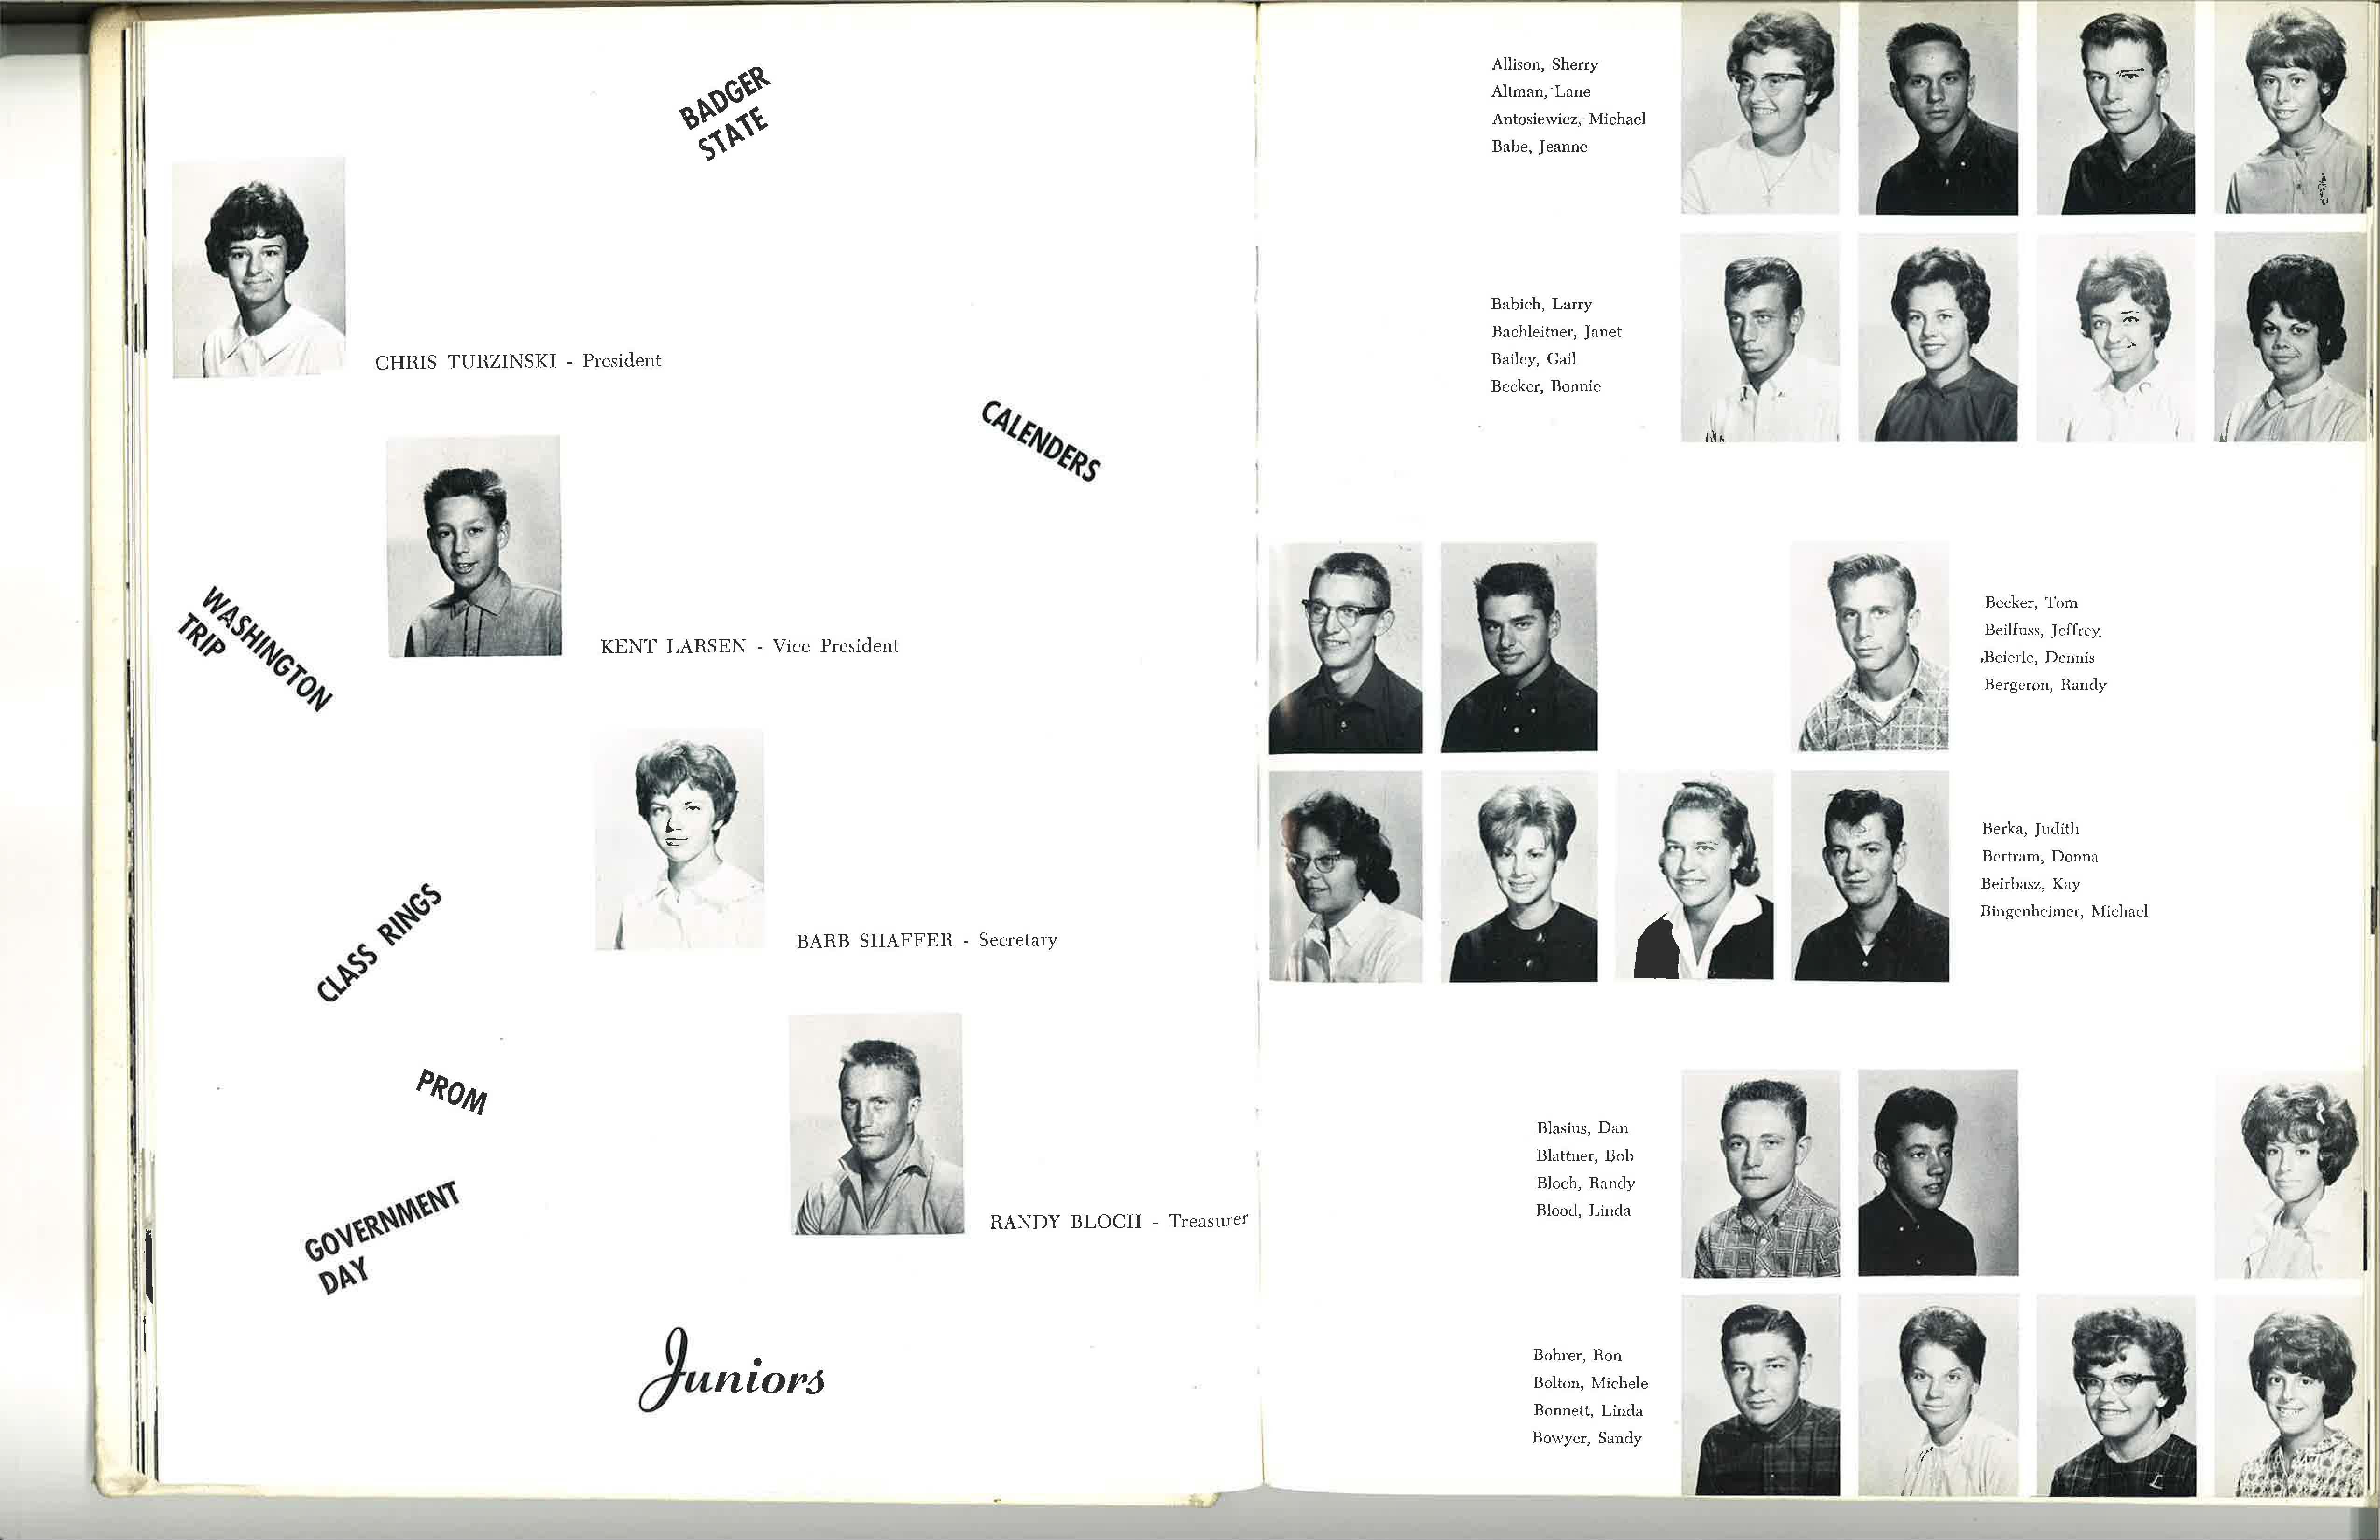 1964_Yearbook_Juniors_46-47.jpg